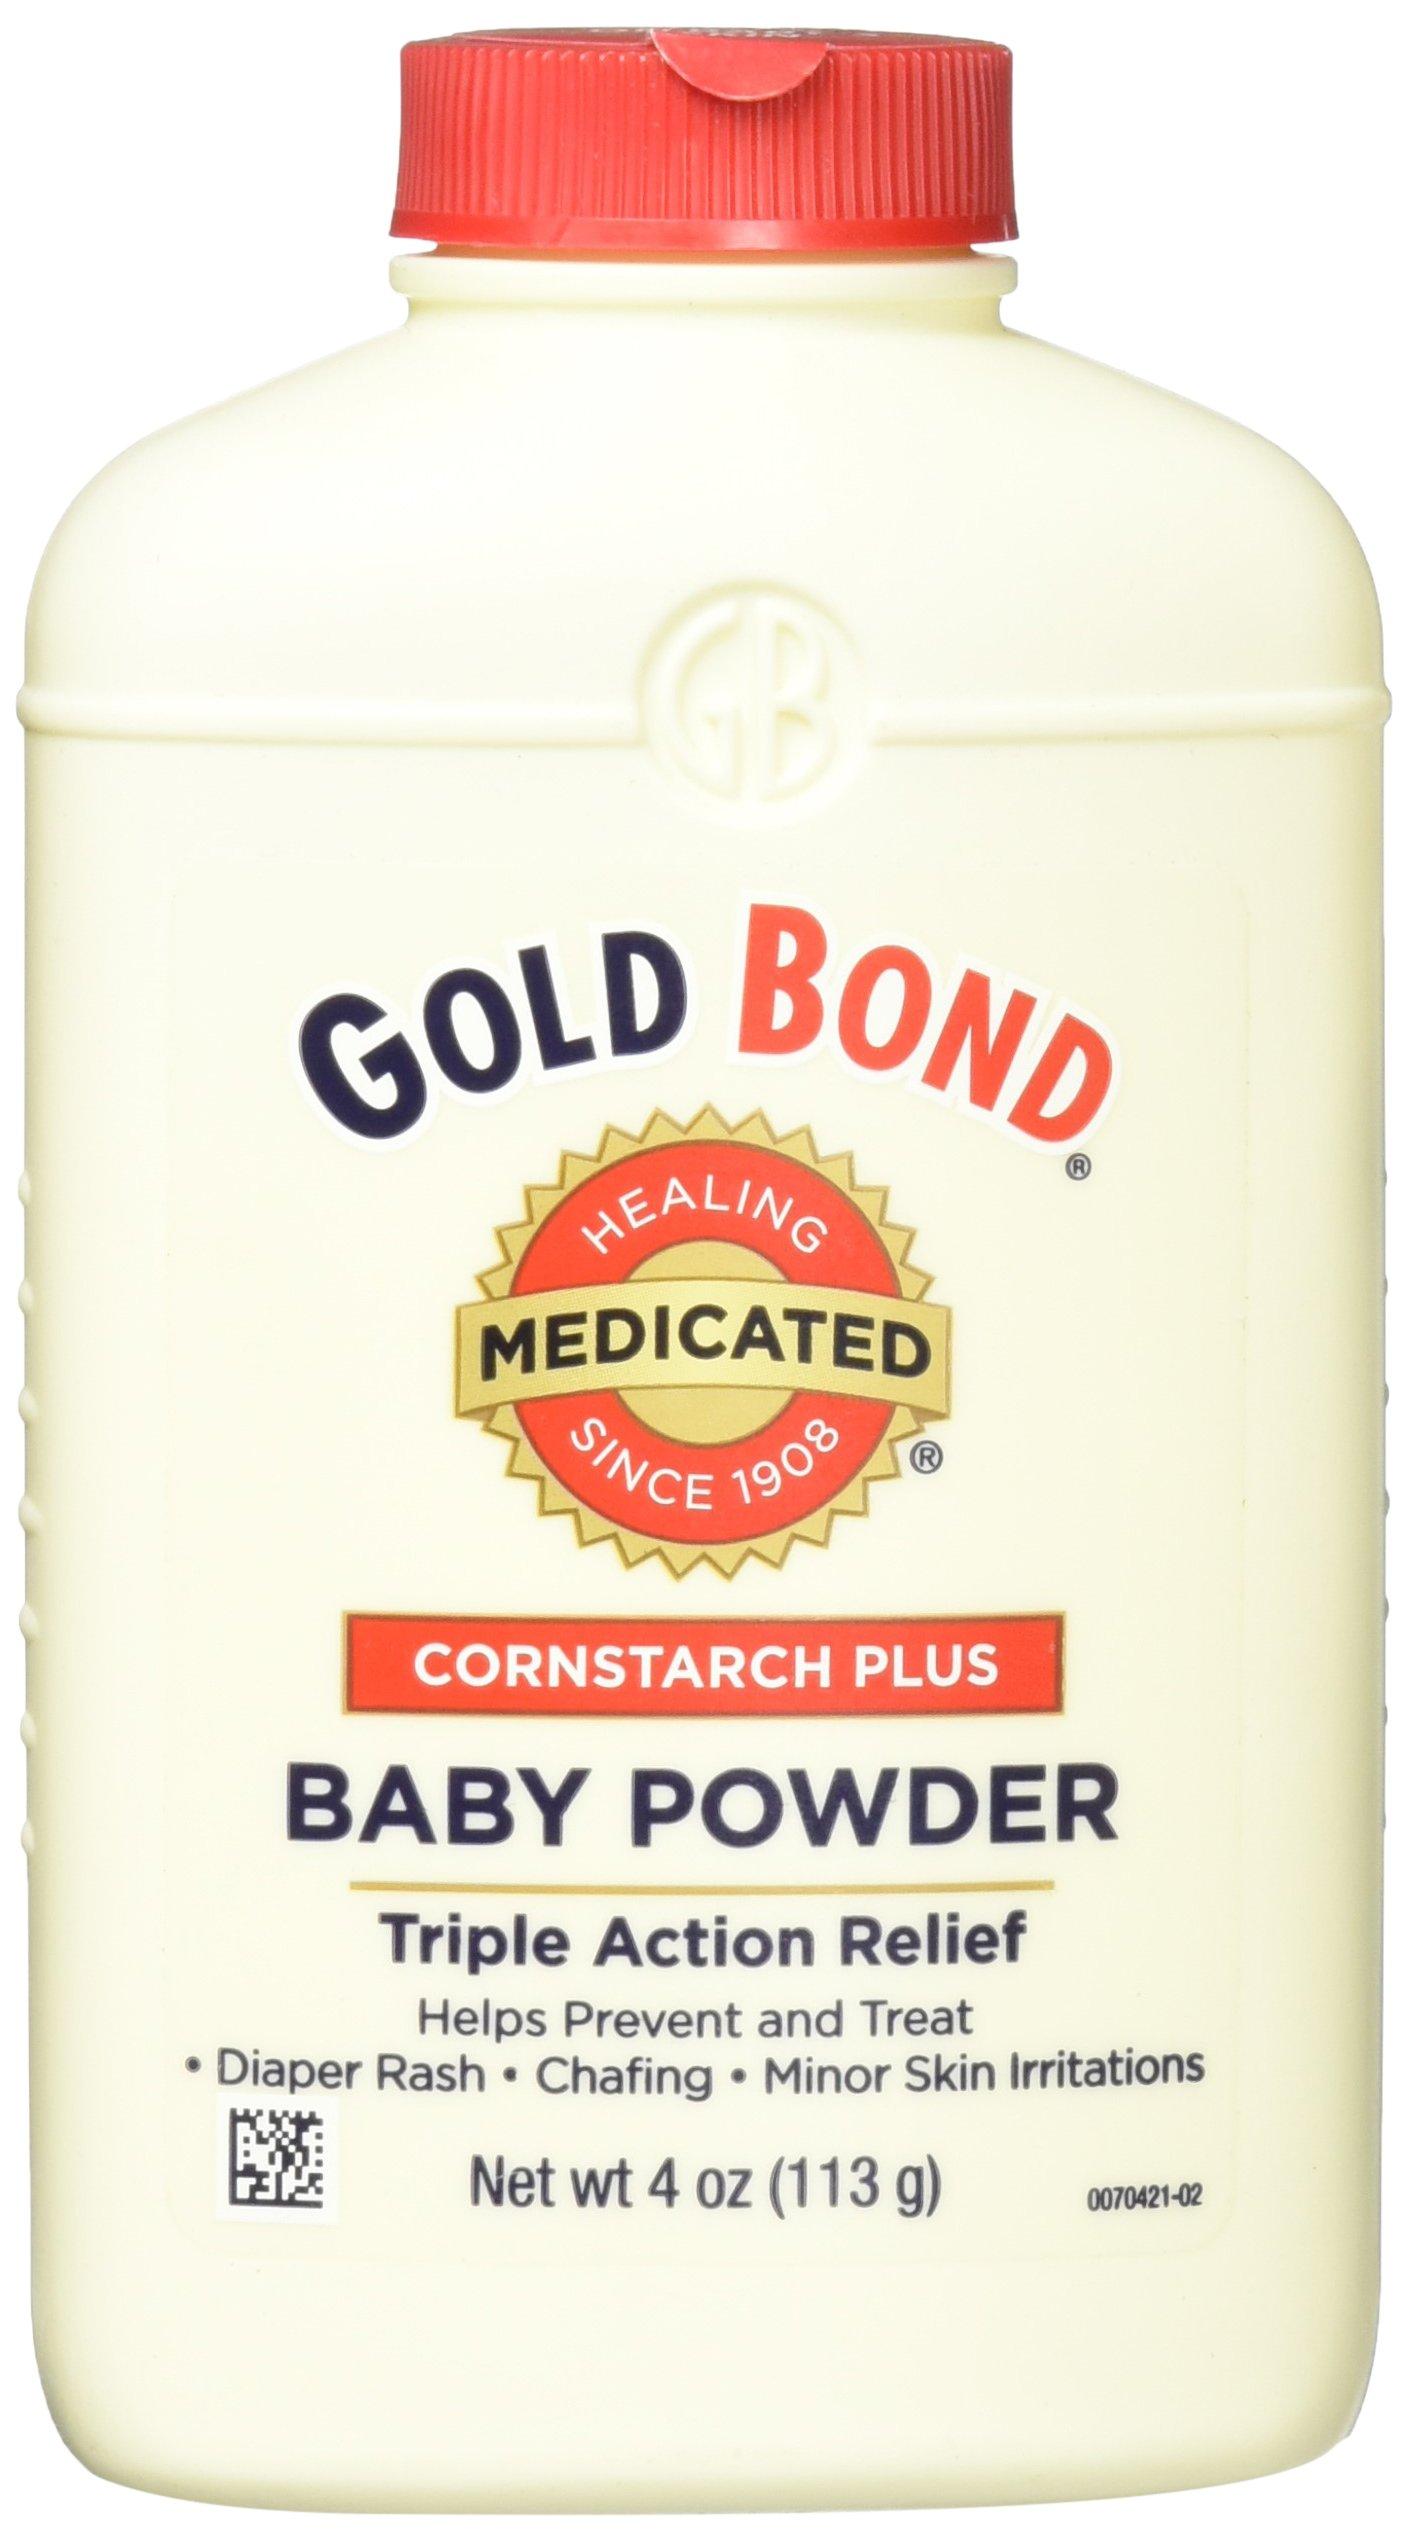 Gold Bond Cornstarch Plus Baby Powder, 4 oz.